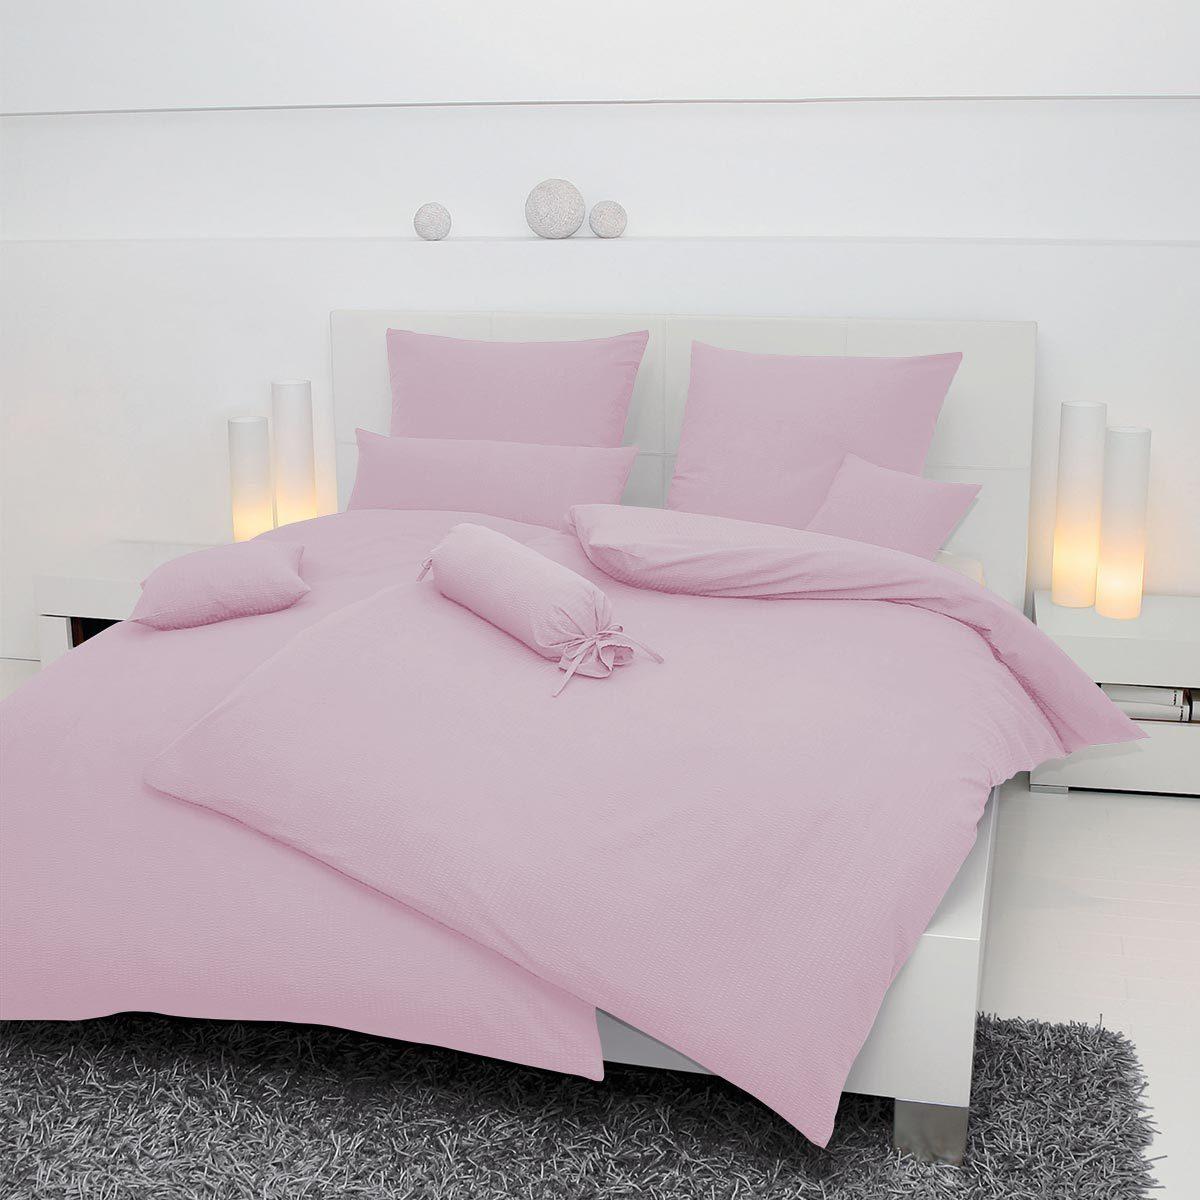 janine mako soft seersucker bettw sche piano zartrosa. Black Bedroom Furniture Sets. Home Design Ideas